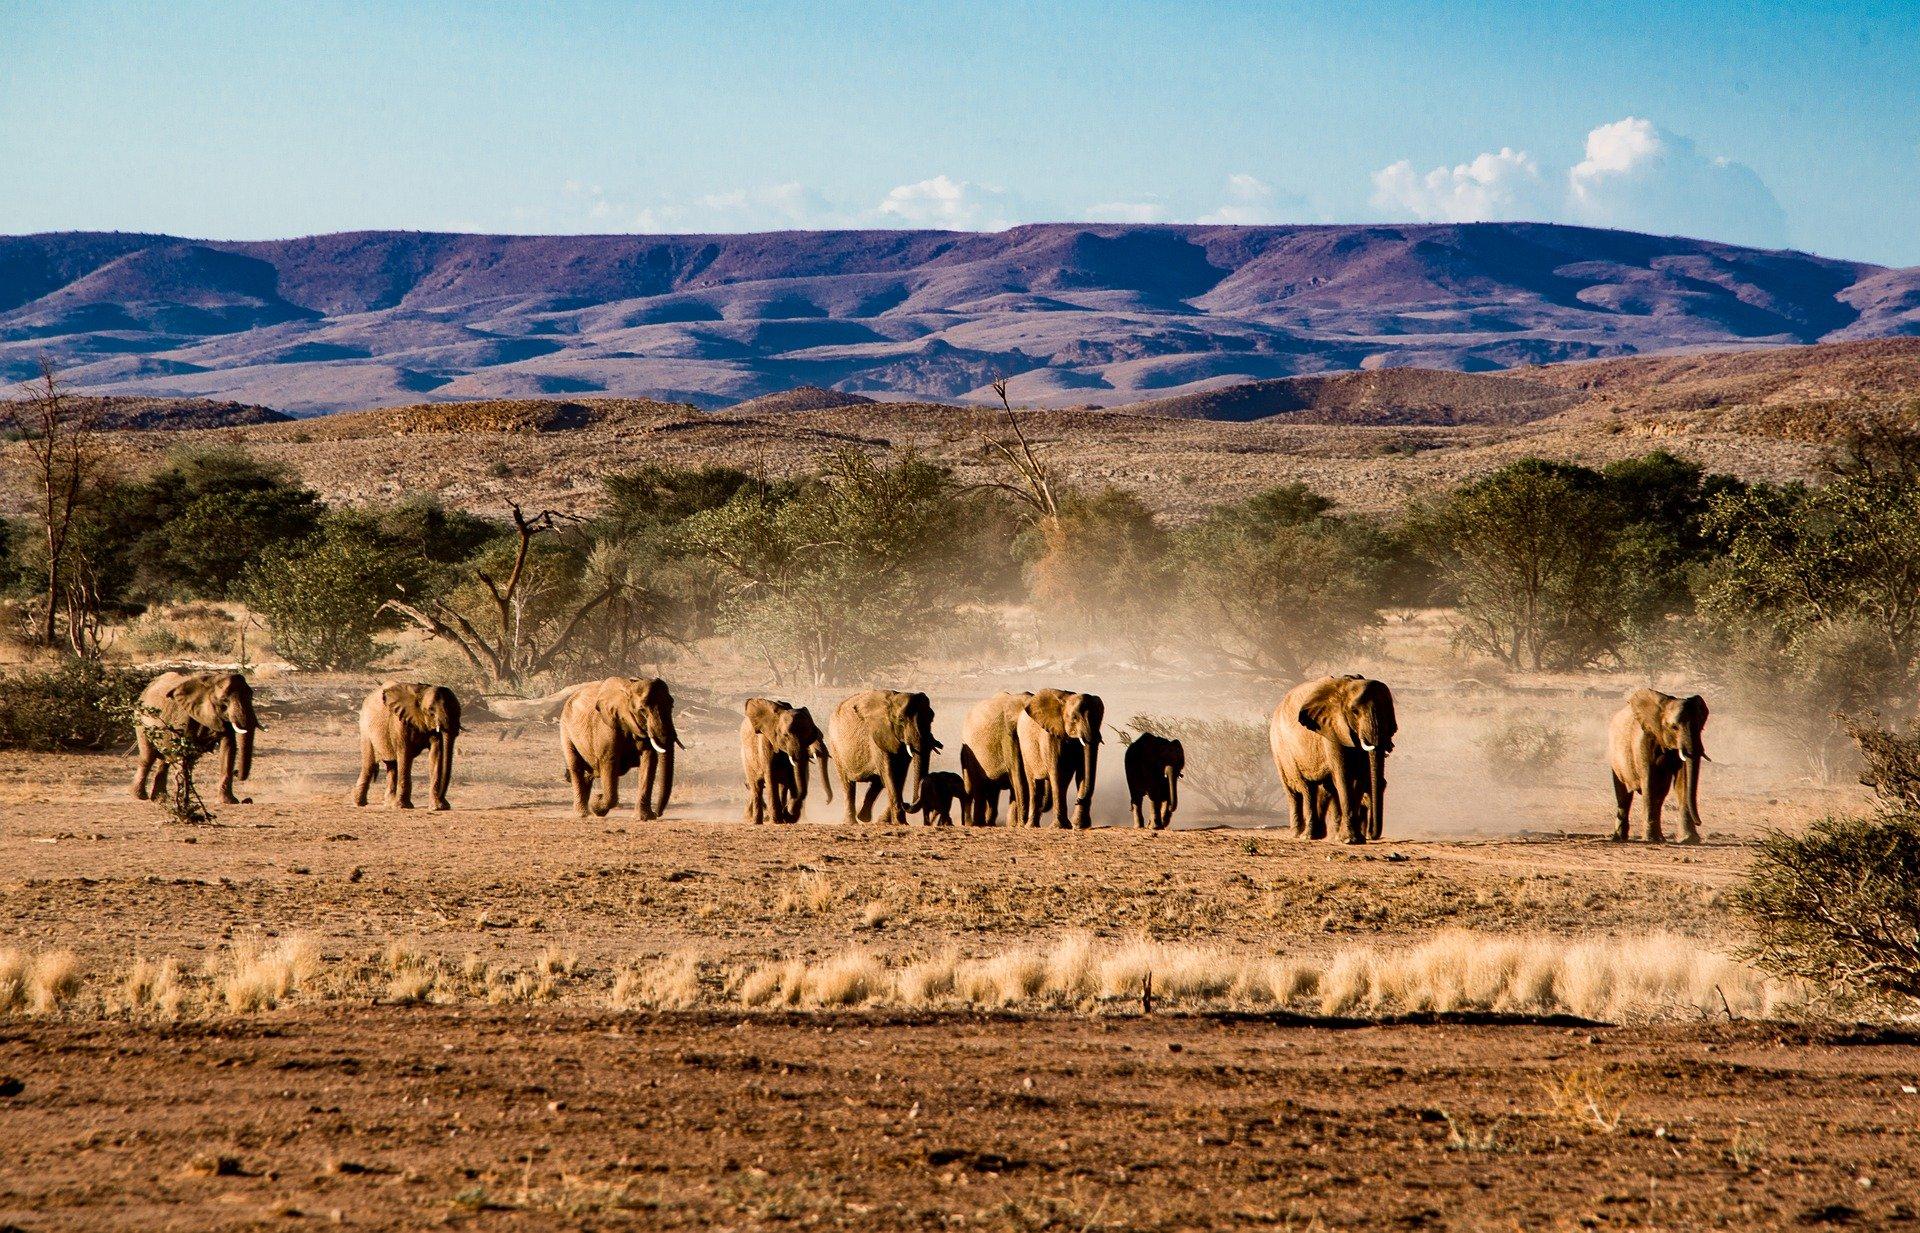 Etosha Elephants Crossing Dry Pan